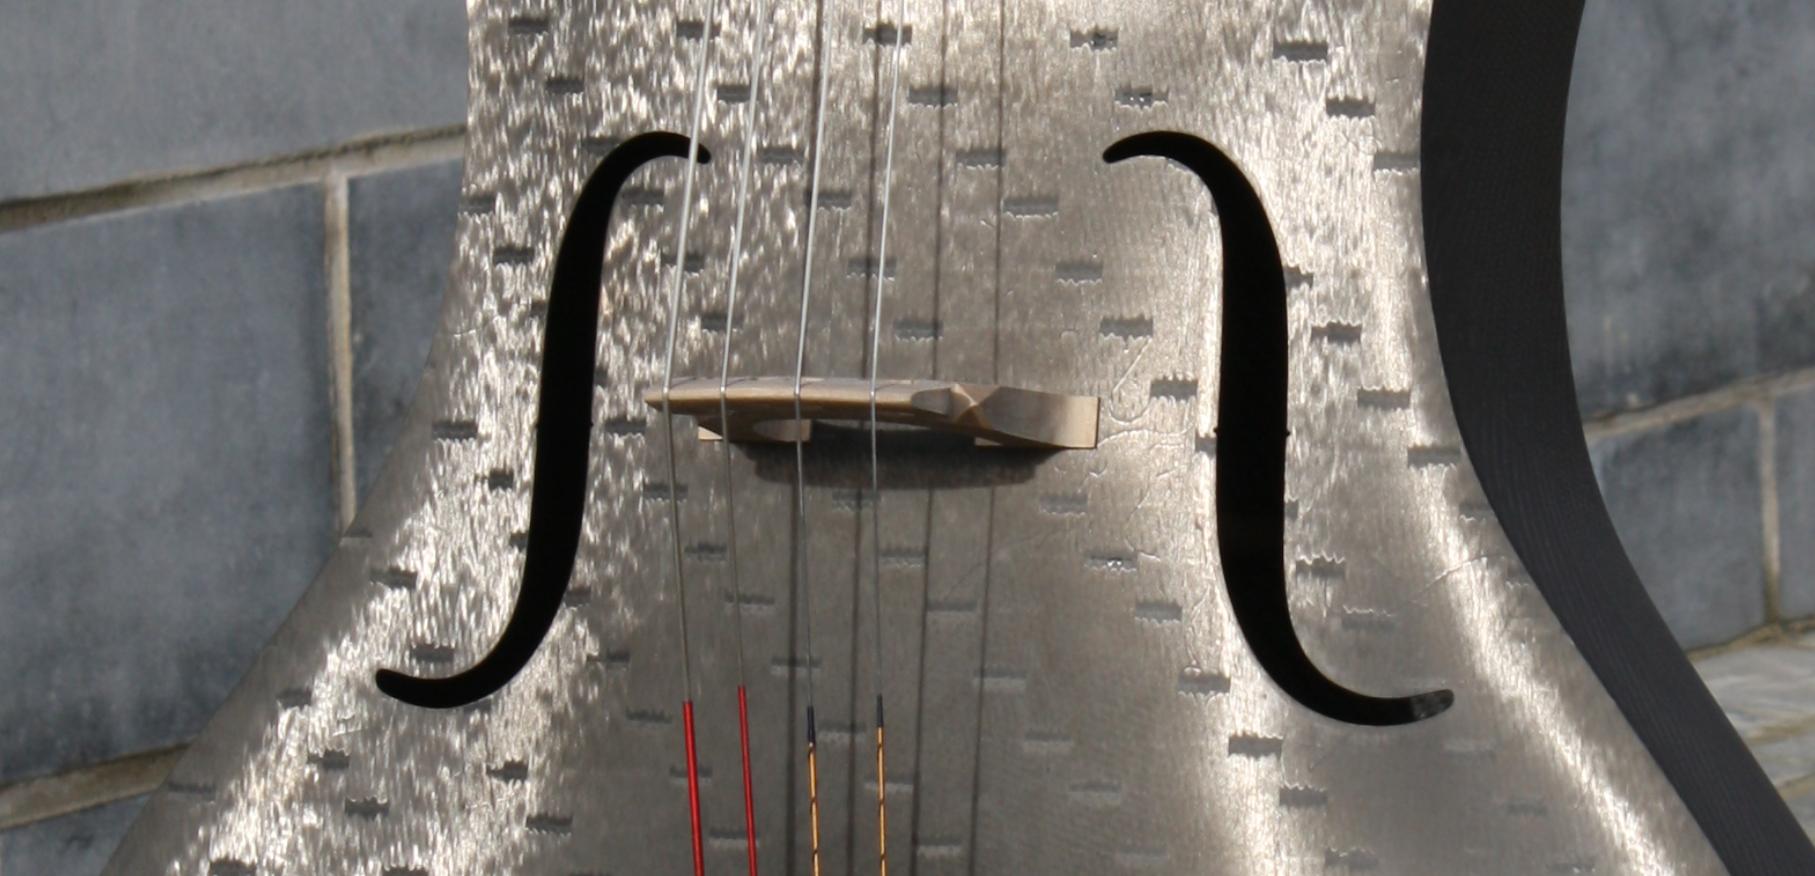 Tim Duerinck Carbon Fiber Cello Detail of f-holes